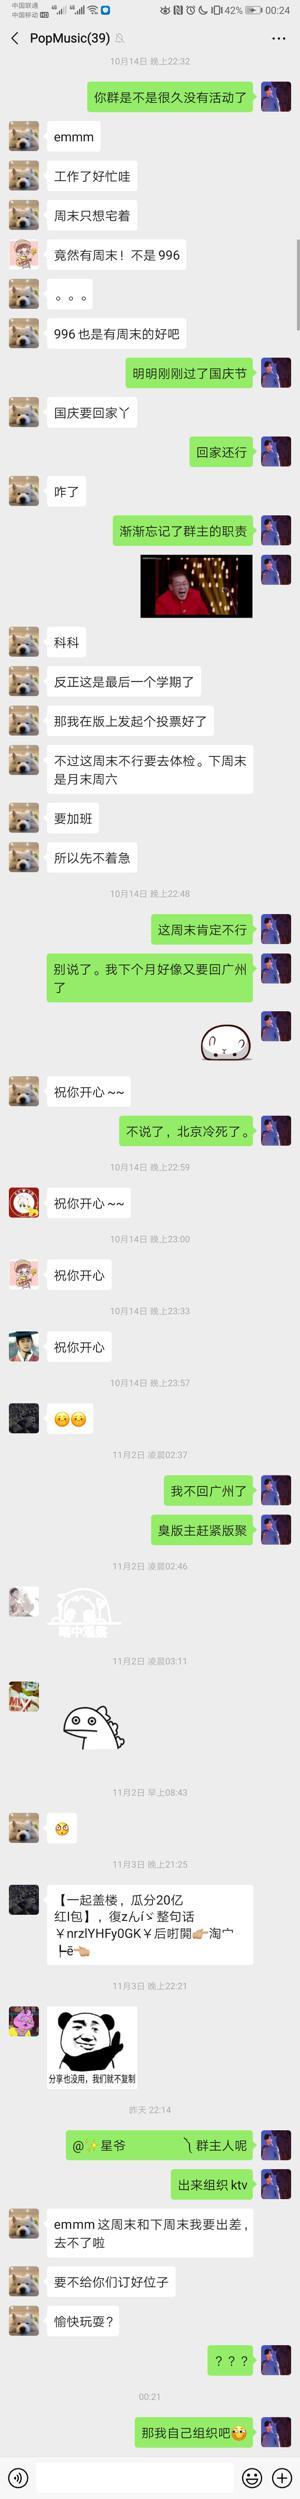 Screenshot_20191107_002410_com.tencent.mm.jpg